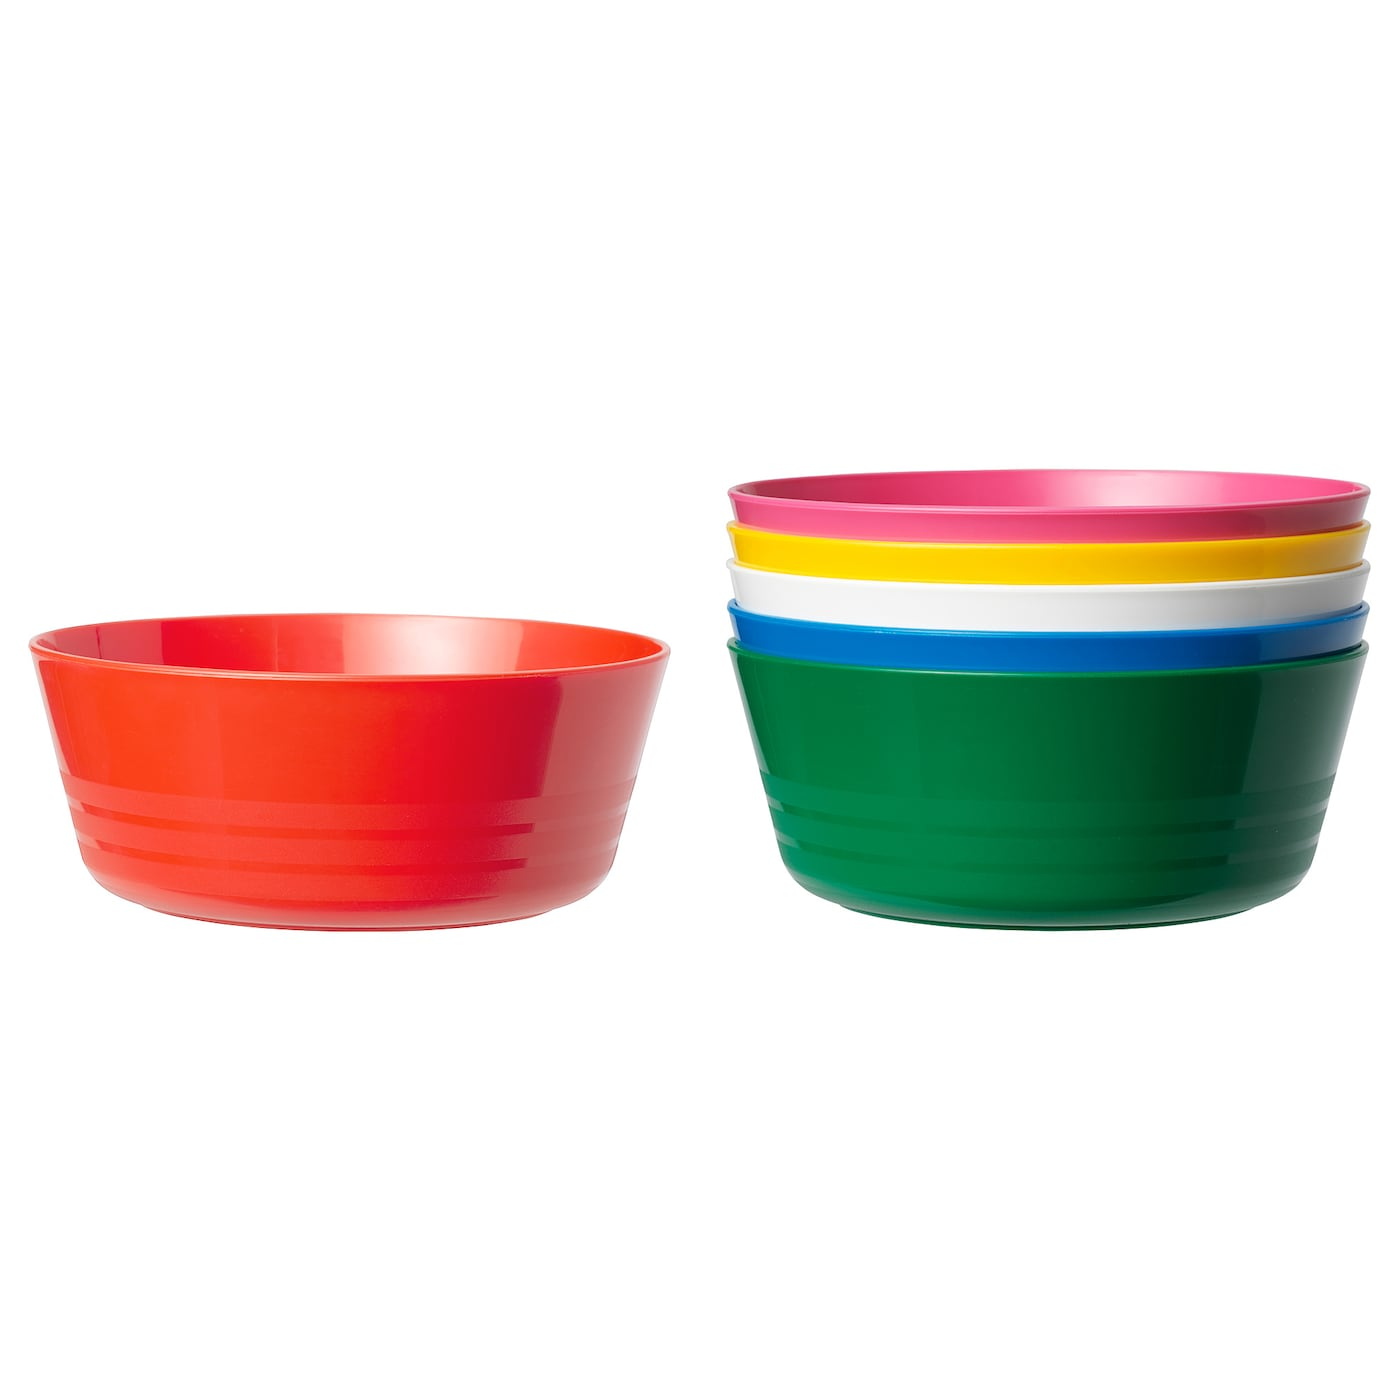 IKEA KALAS CHILDREN/'S PLASTIC 36 PIECE CUTLERY SET KIDS BOWLS PLATES CUPS